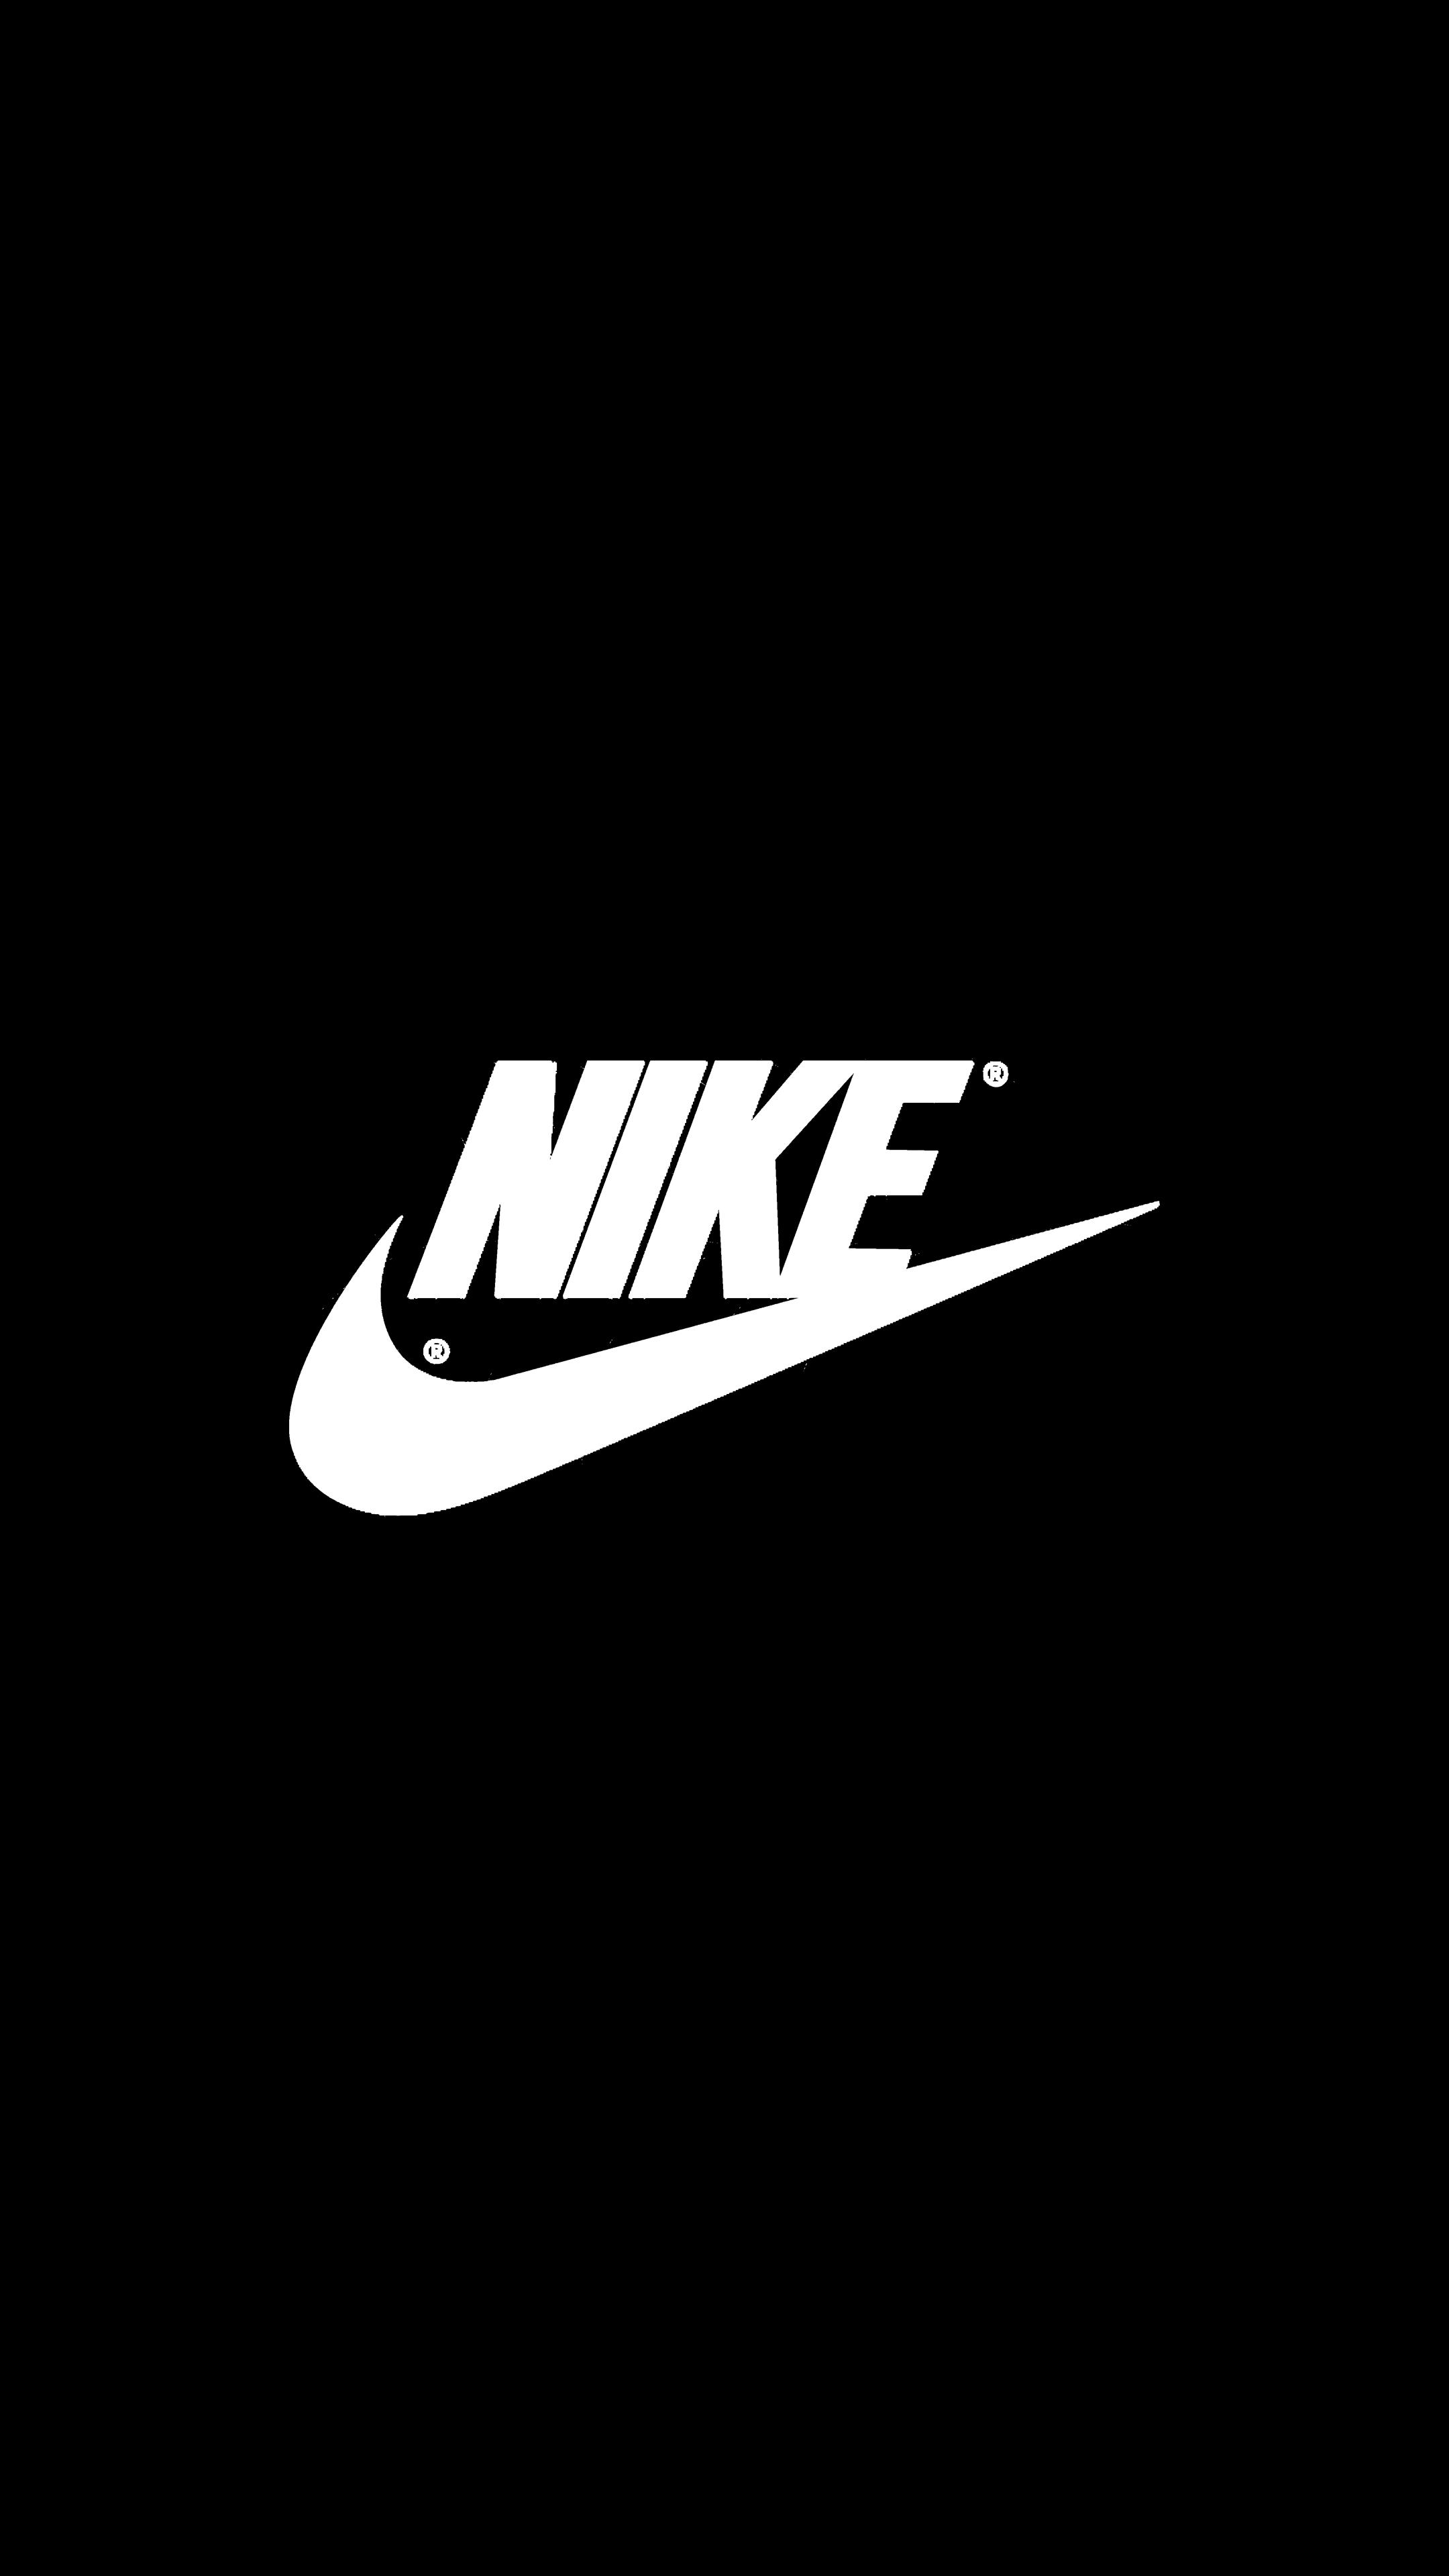 Nike 2160p 4k Oled Wallpaper Nike Wallpaper In 2019 Nike